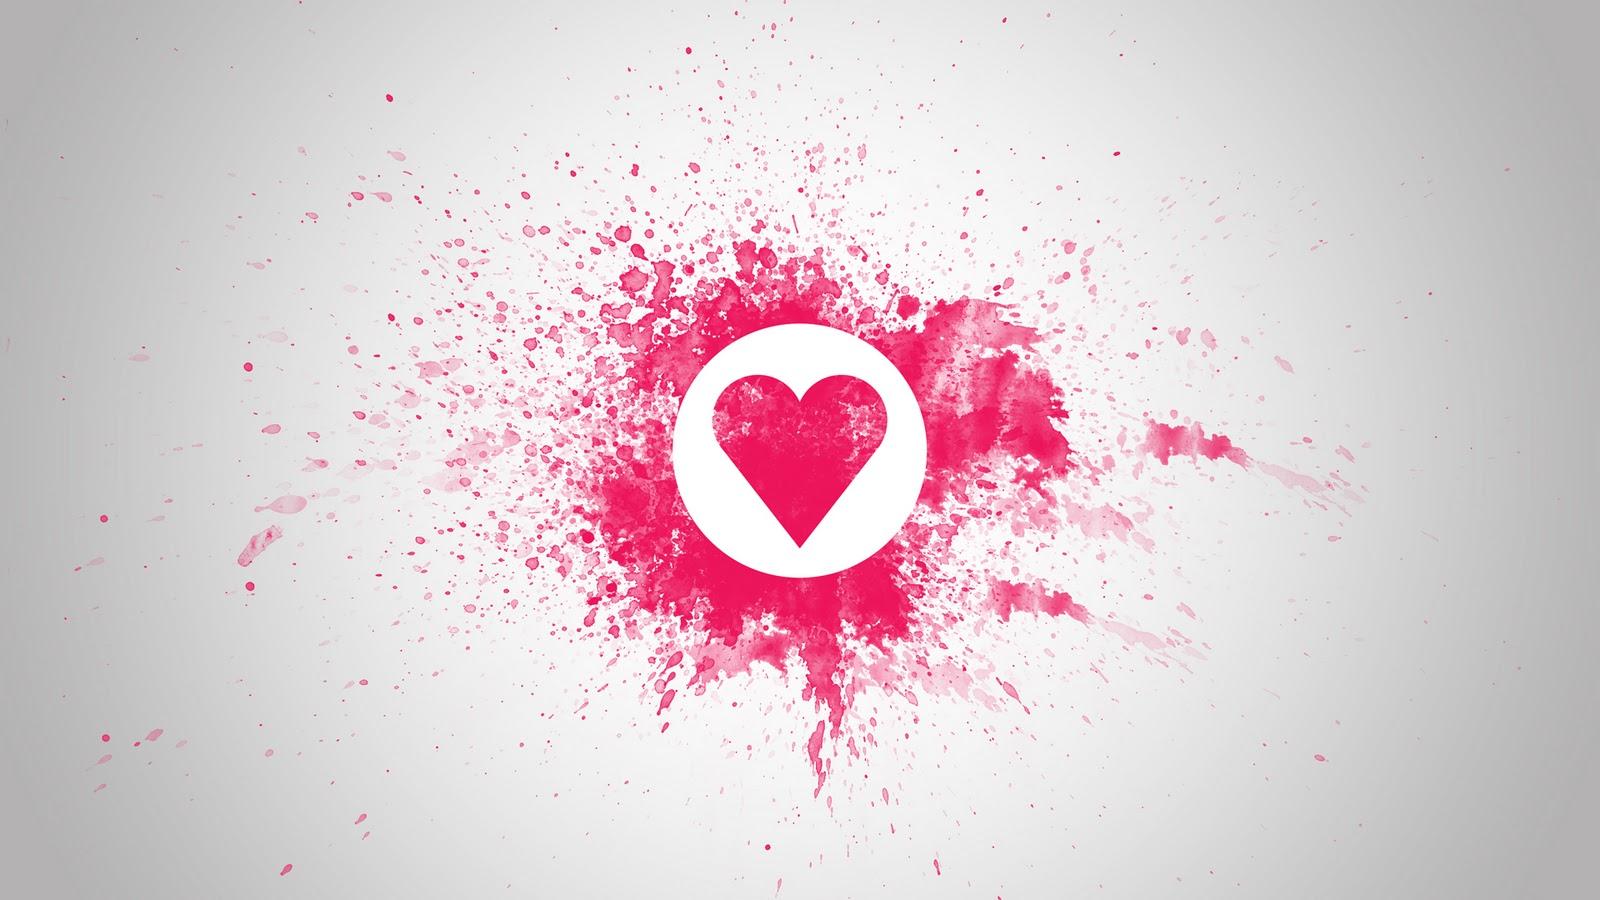 Love heart pink 1600x900 hd wallpaper love wallpapers - Love wallpaper hd ...